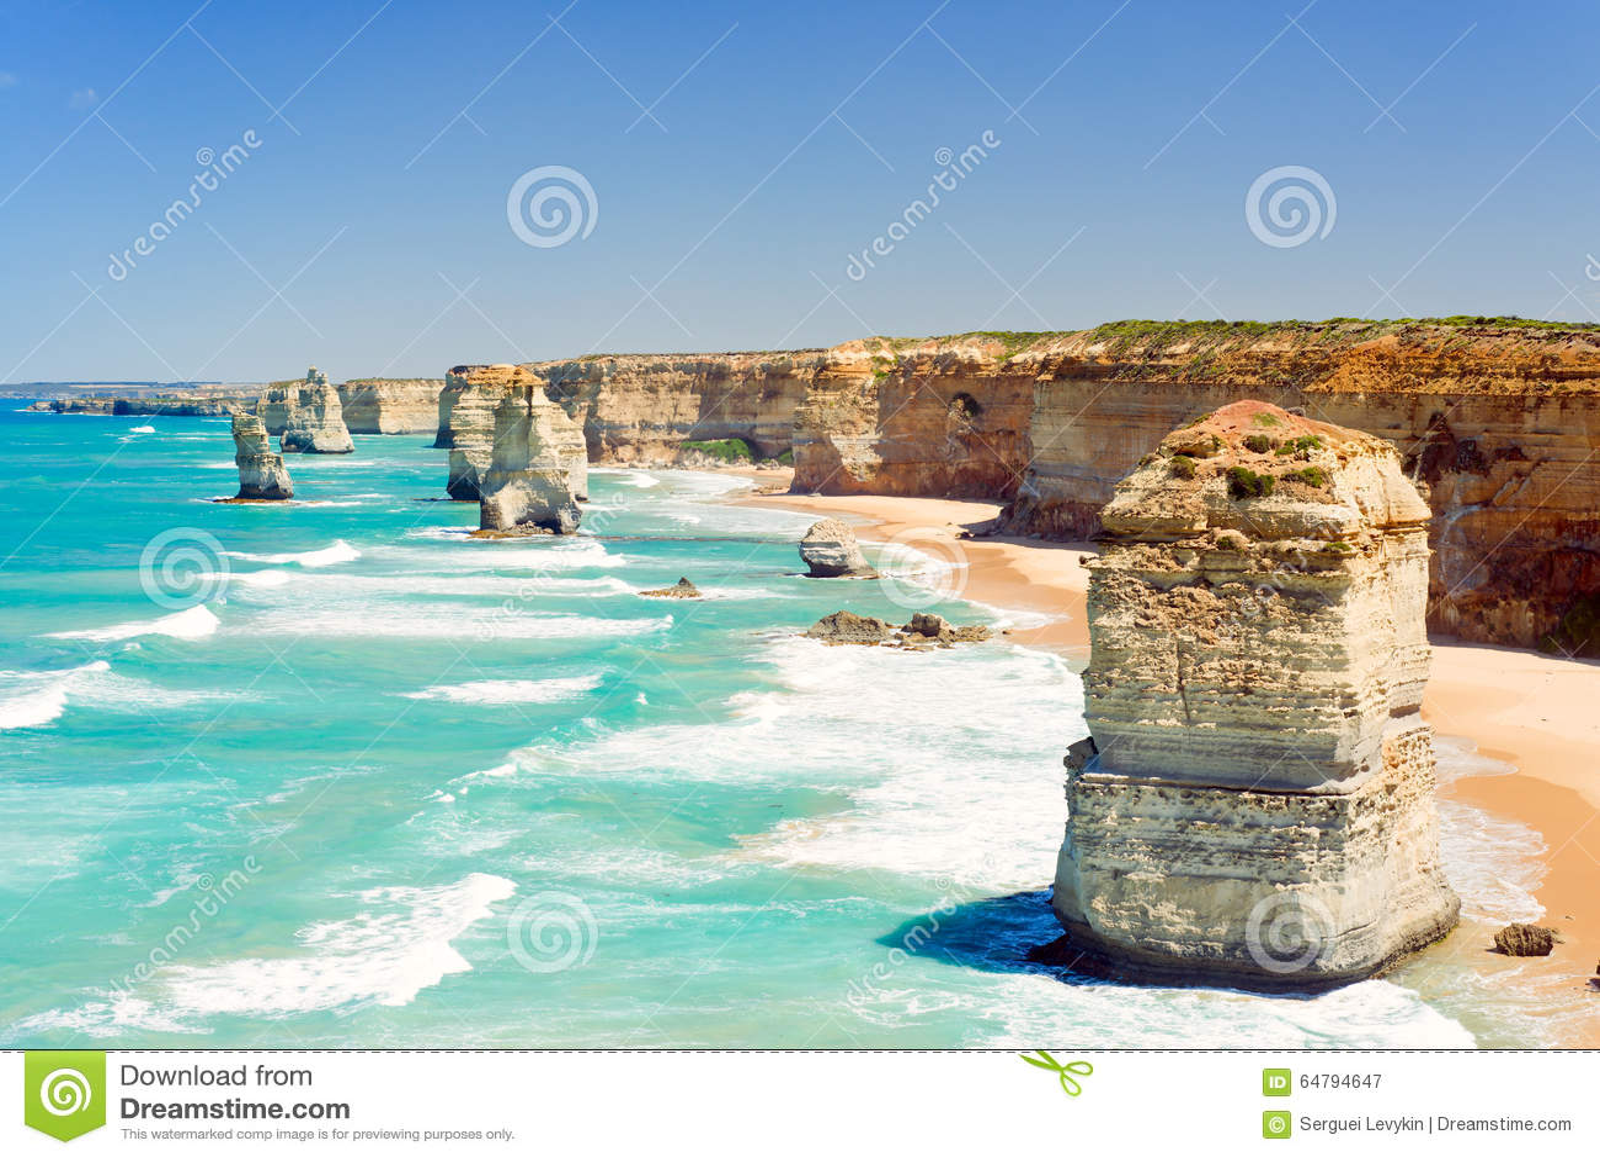 The Twelve Apostles Great Ocean Road Australia Stock